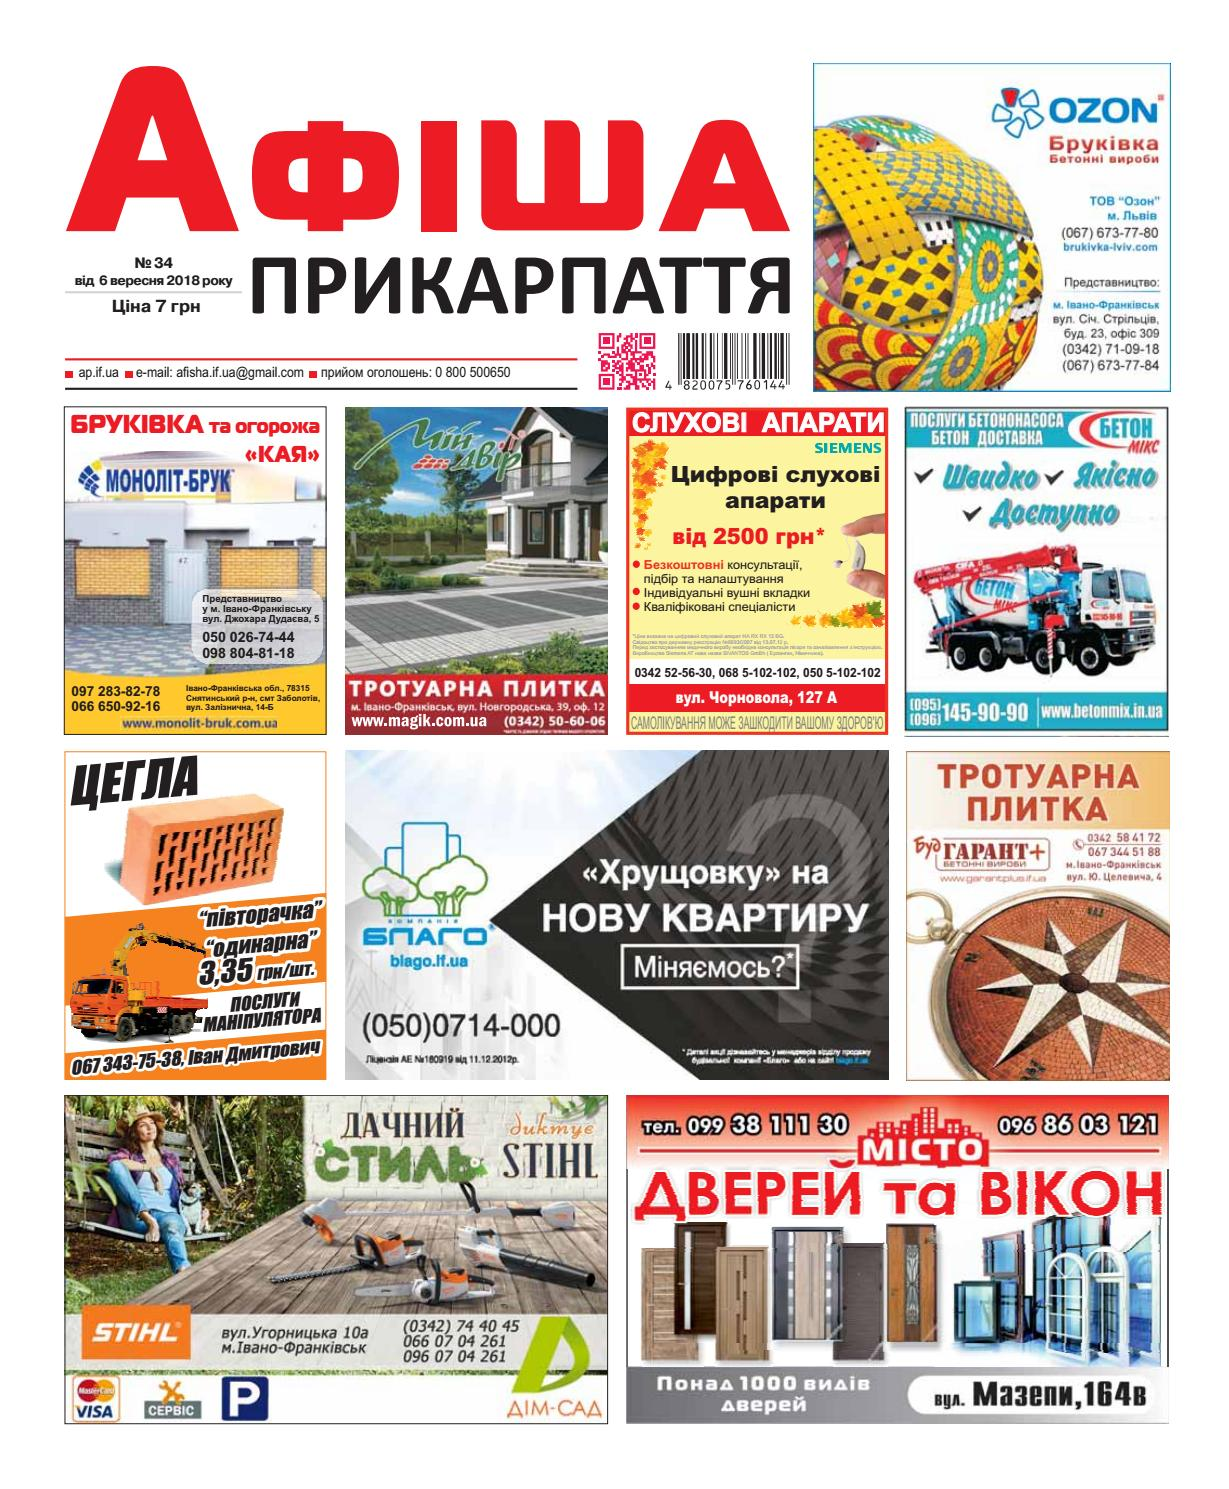 Афіша Прикарпаття №34 by Olya Olya - issuu 144a67c4c0096